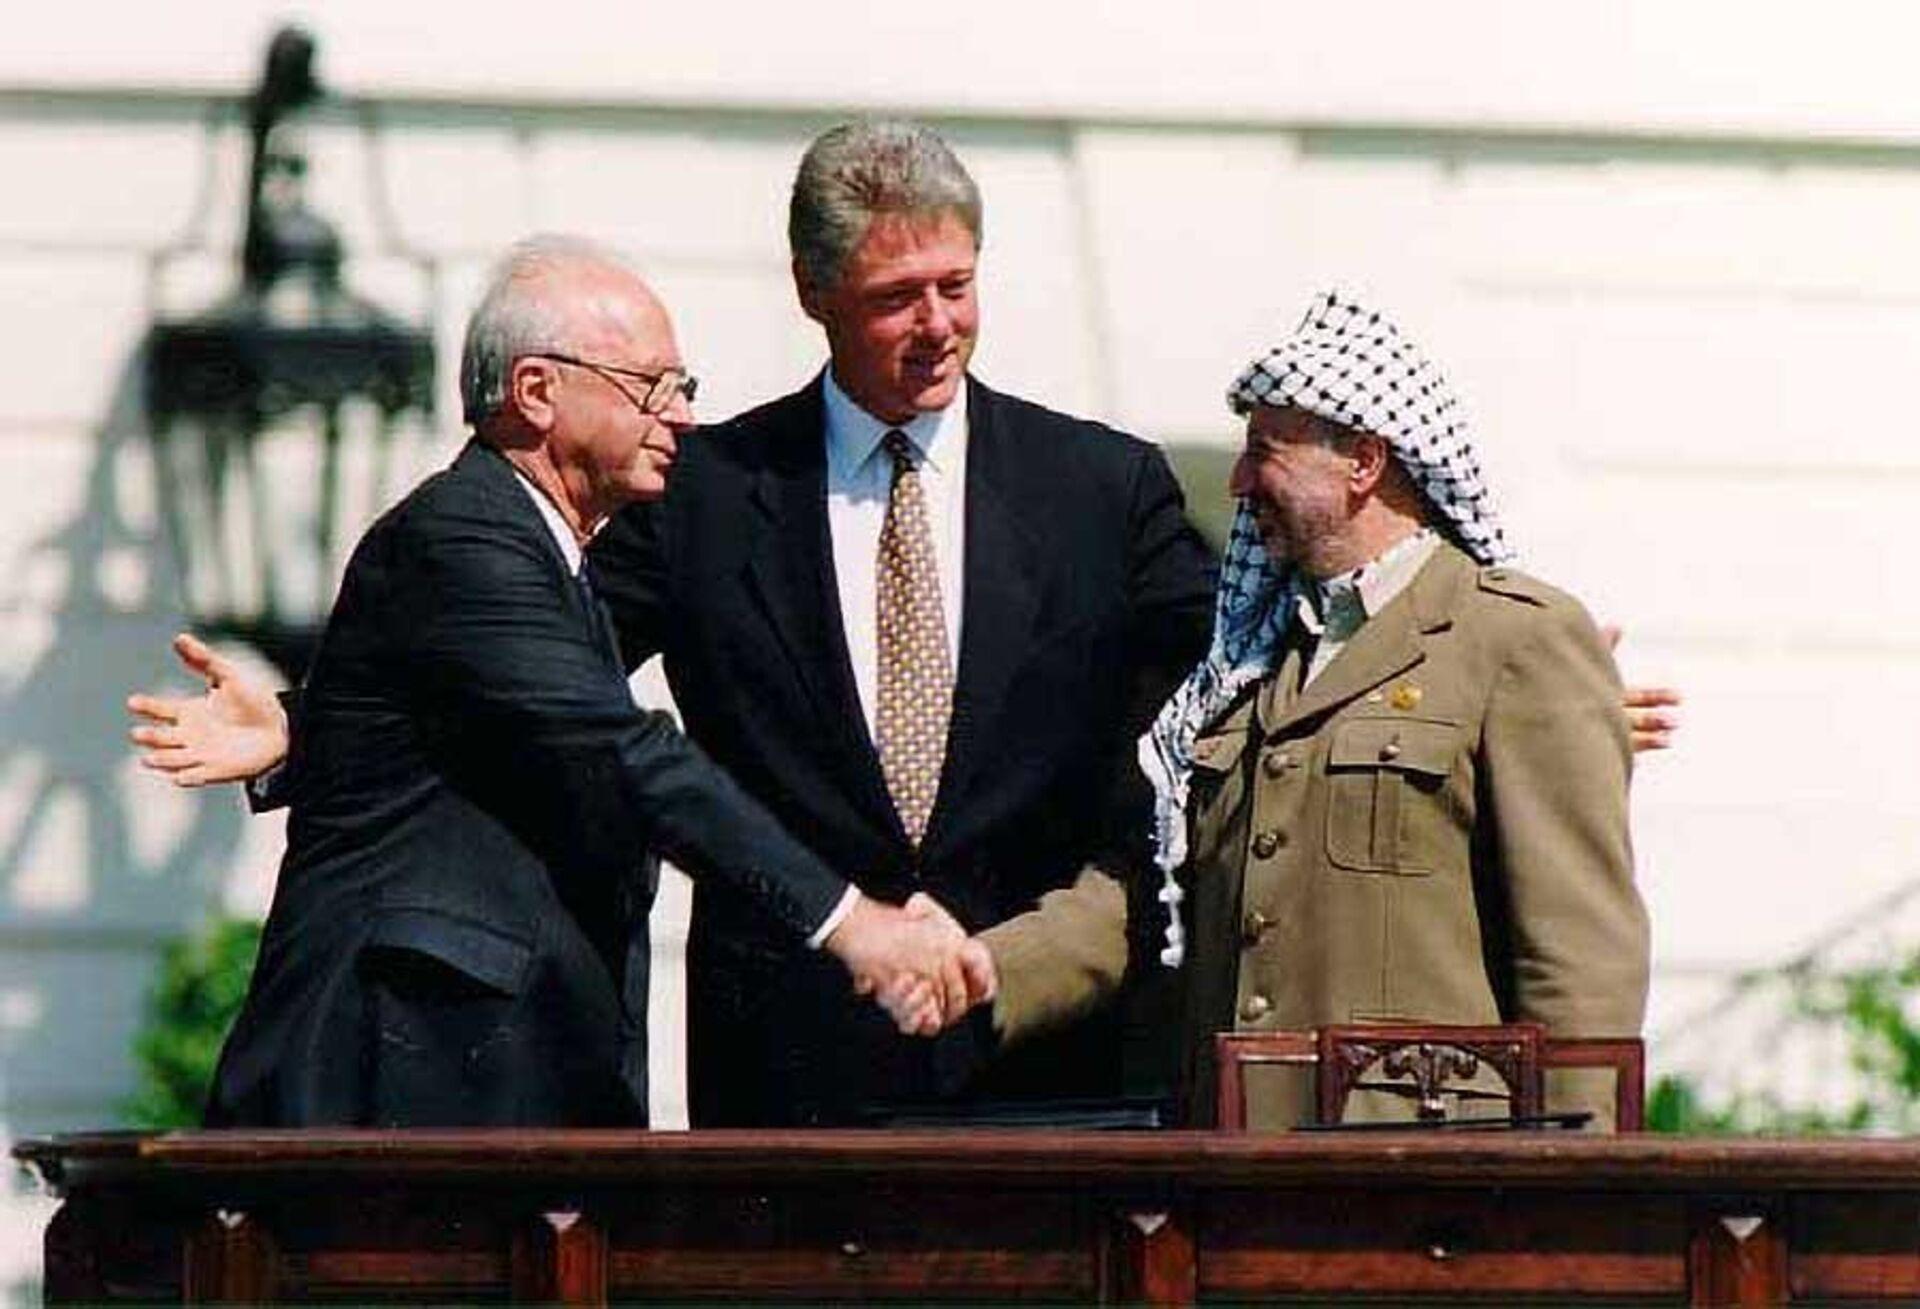 Ицхак Рабин, Билл Клинтон и Ясир Арафат, 13 сентября 1993. Вашингтон - РИА Новости, 1920, 29.10.2020